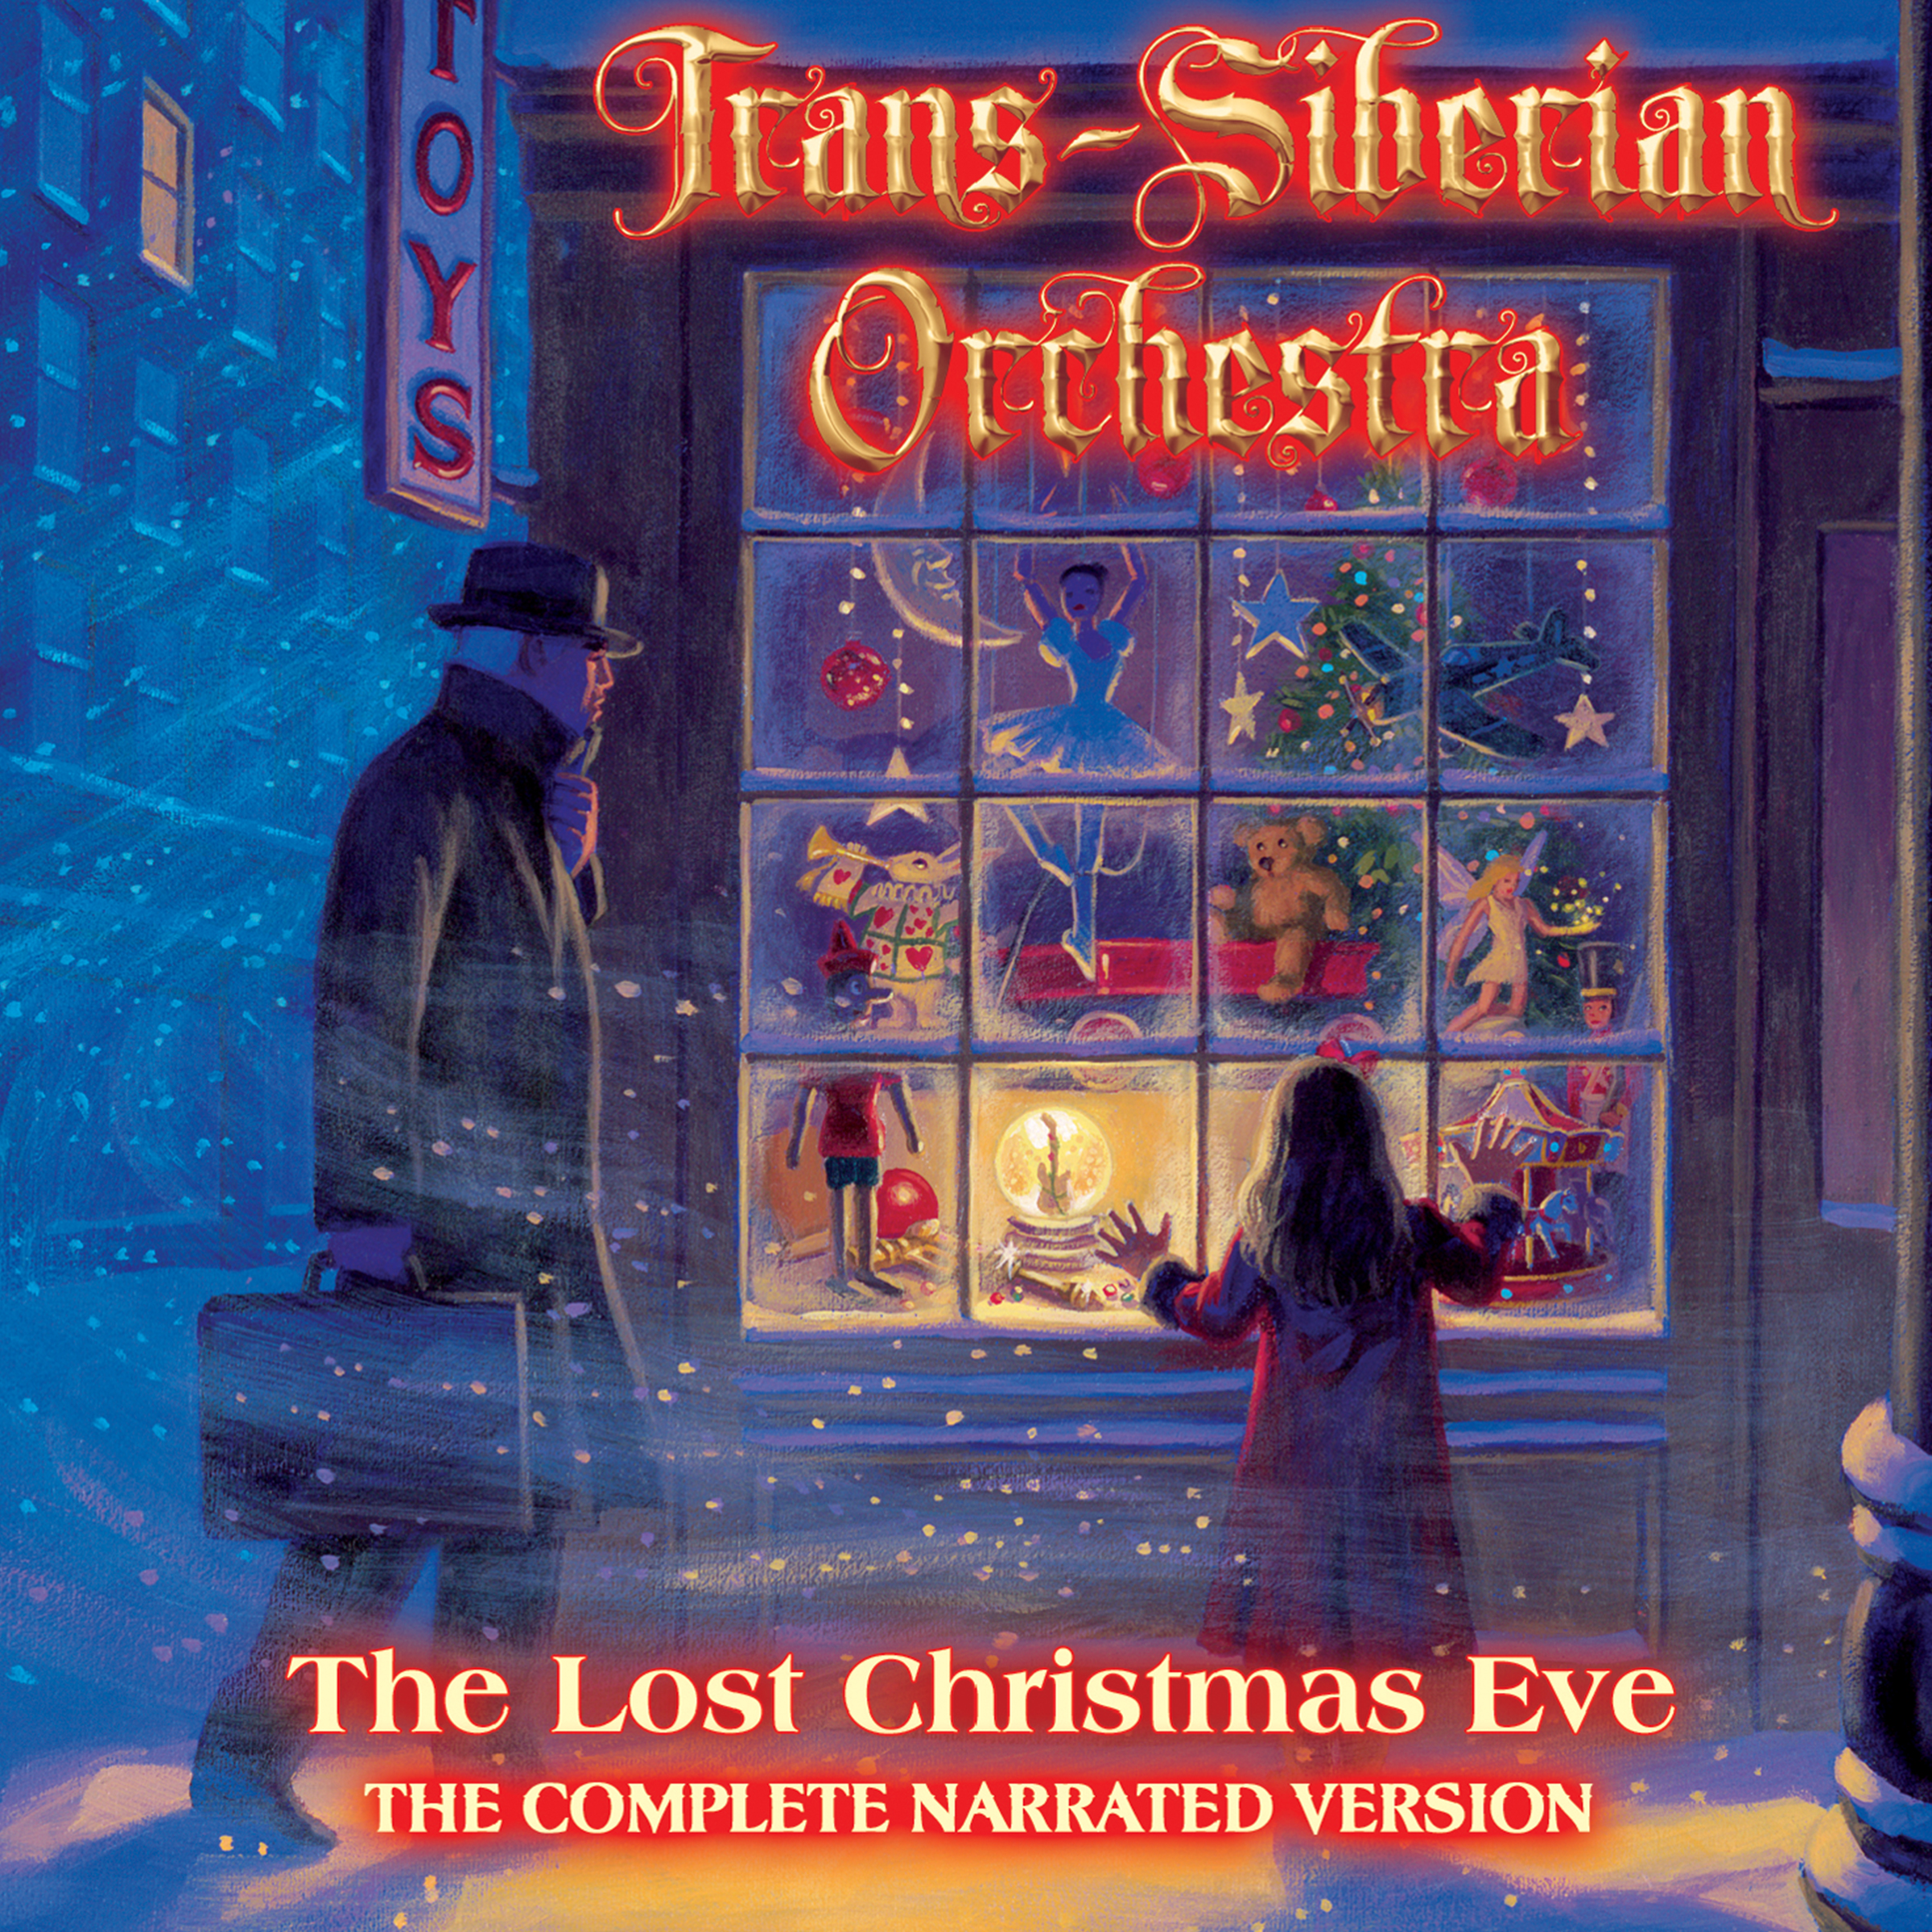 listen free to trans siberian orchestra christmas canon rock radio iheartradio